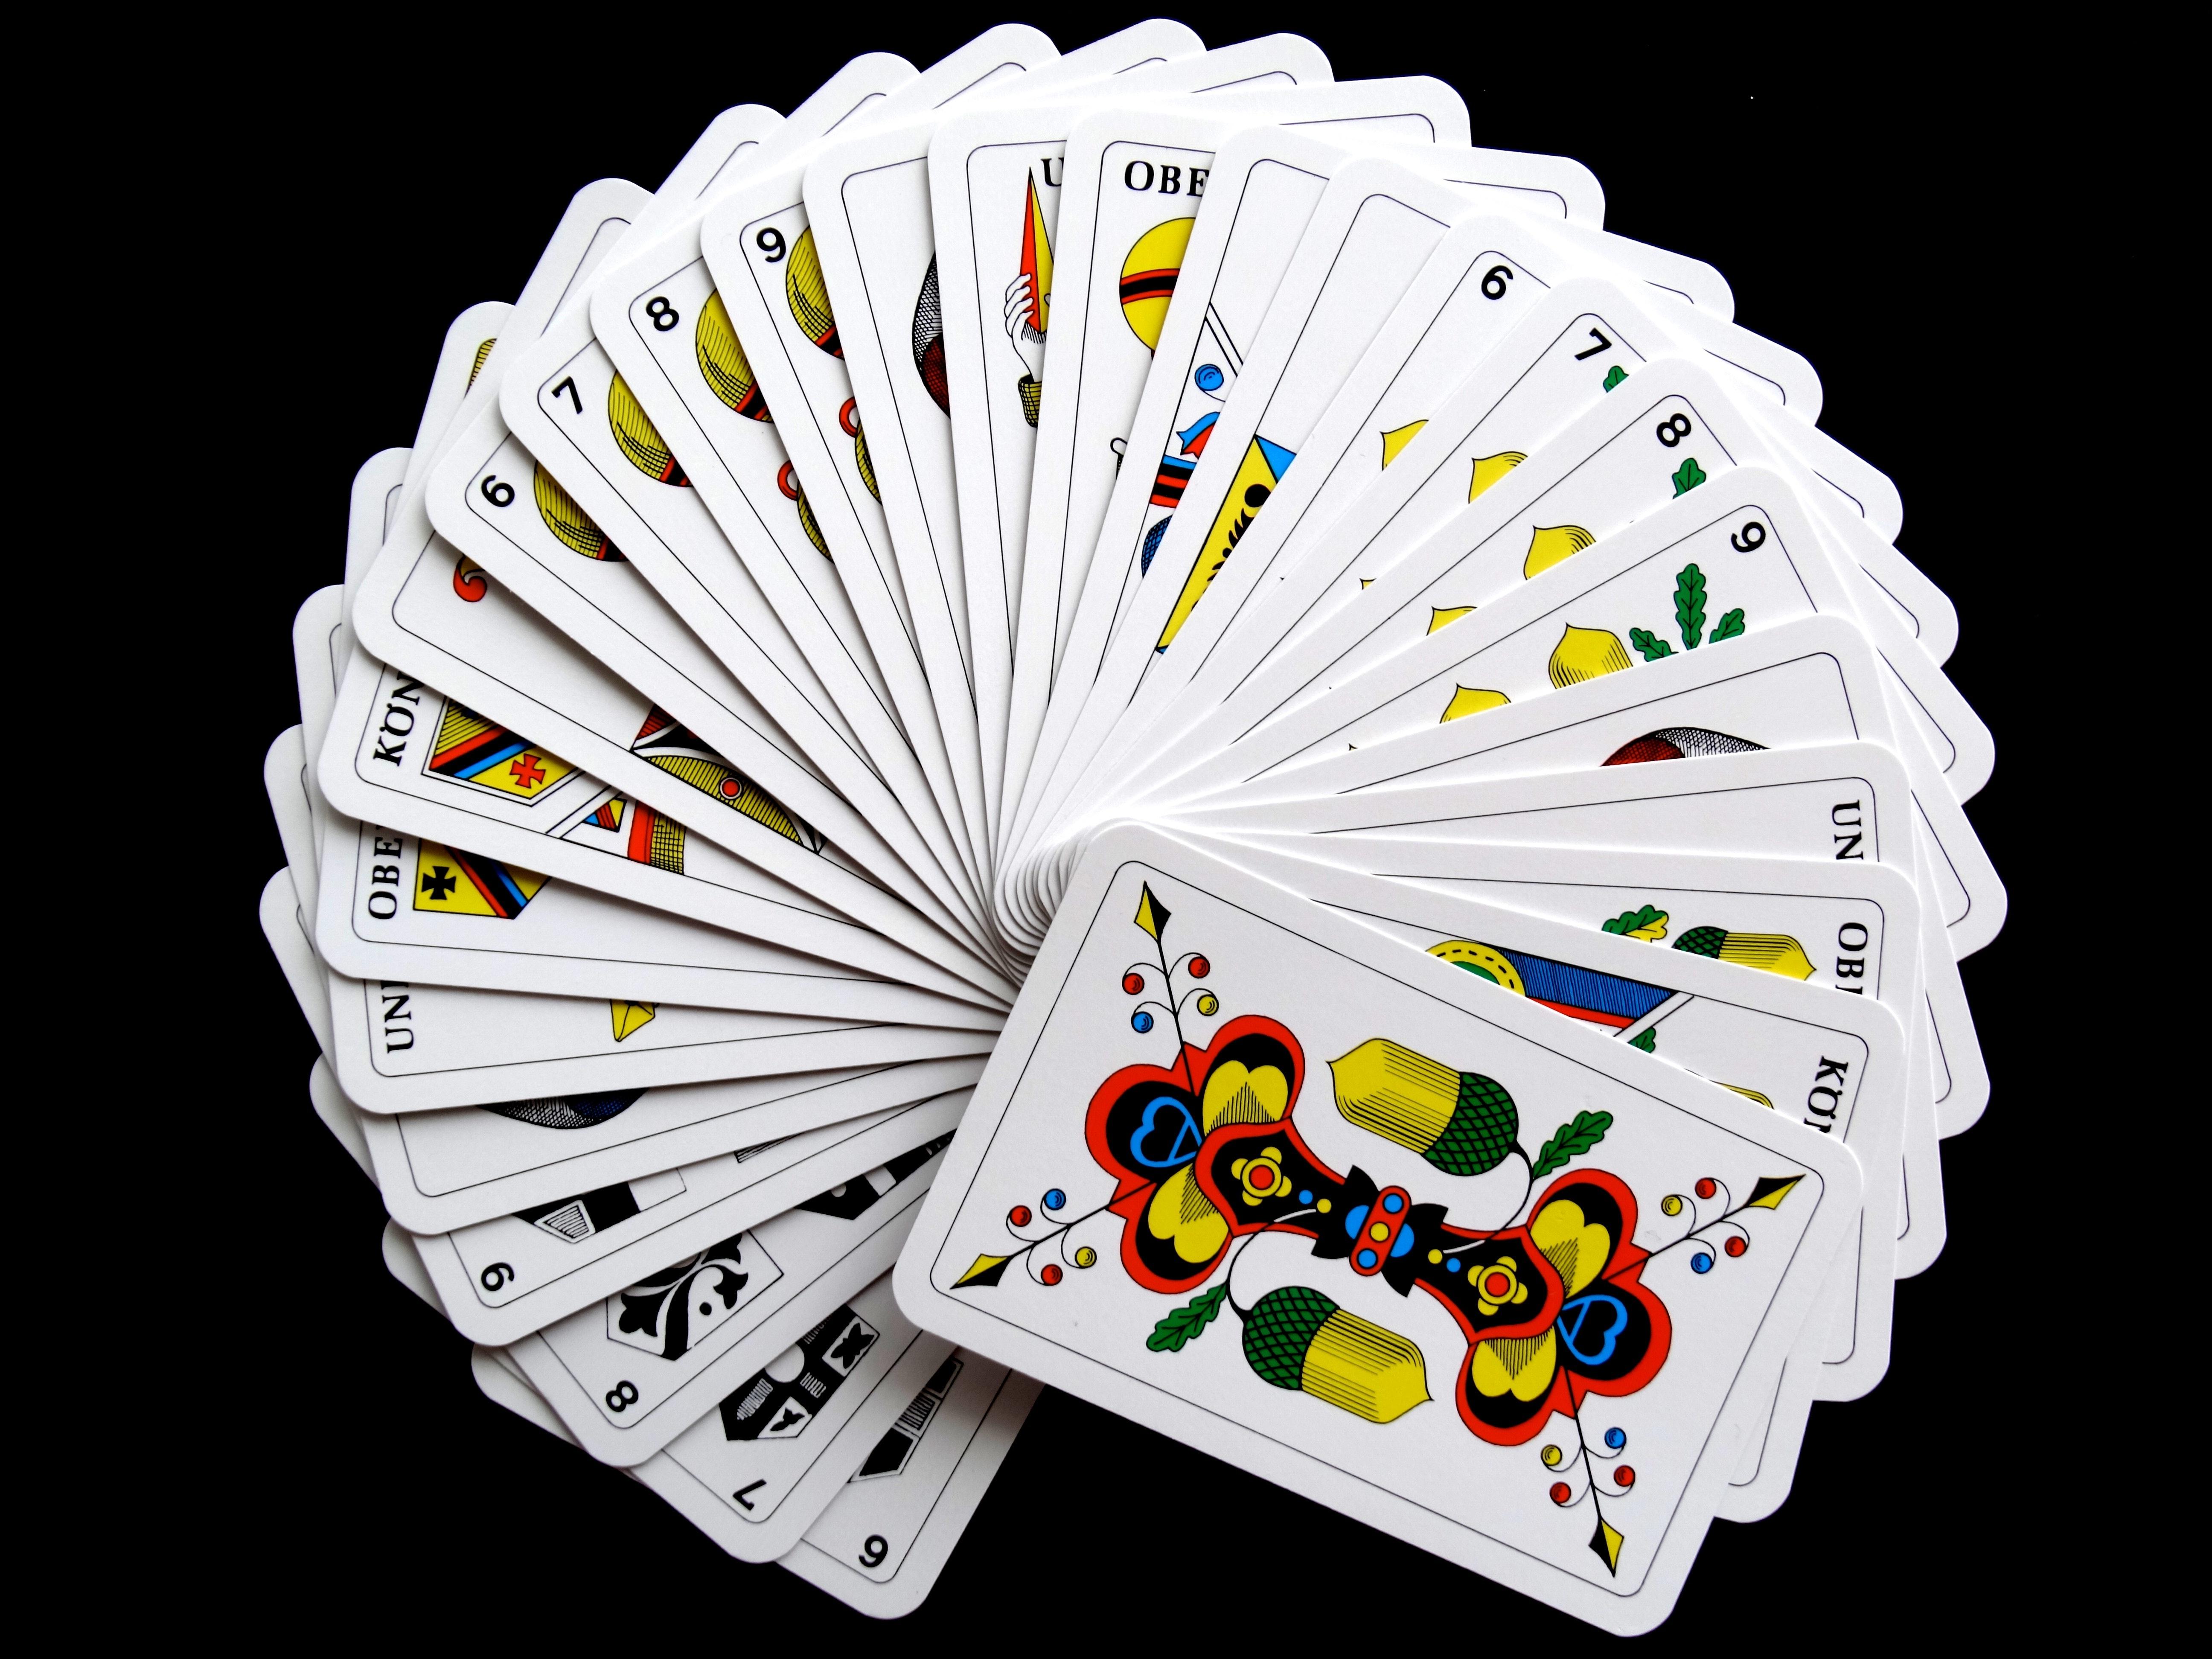 a tarot card deck fanned out